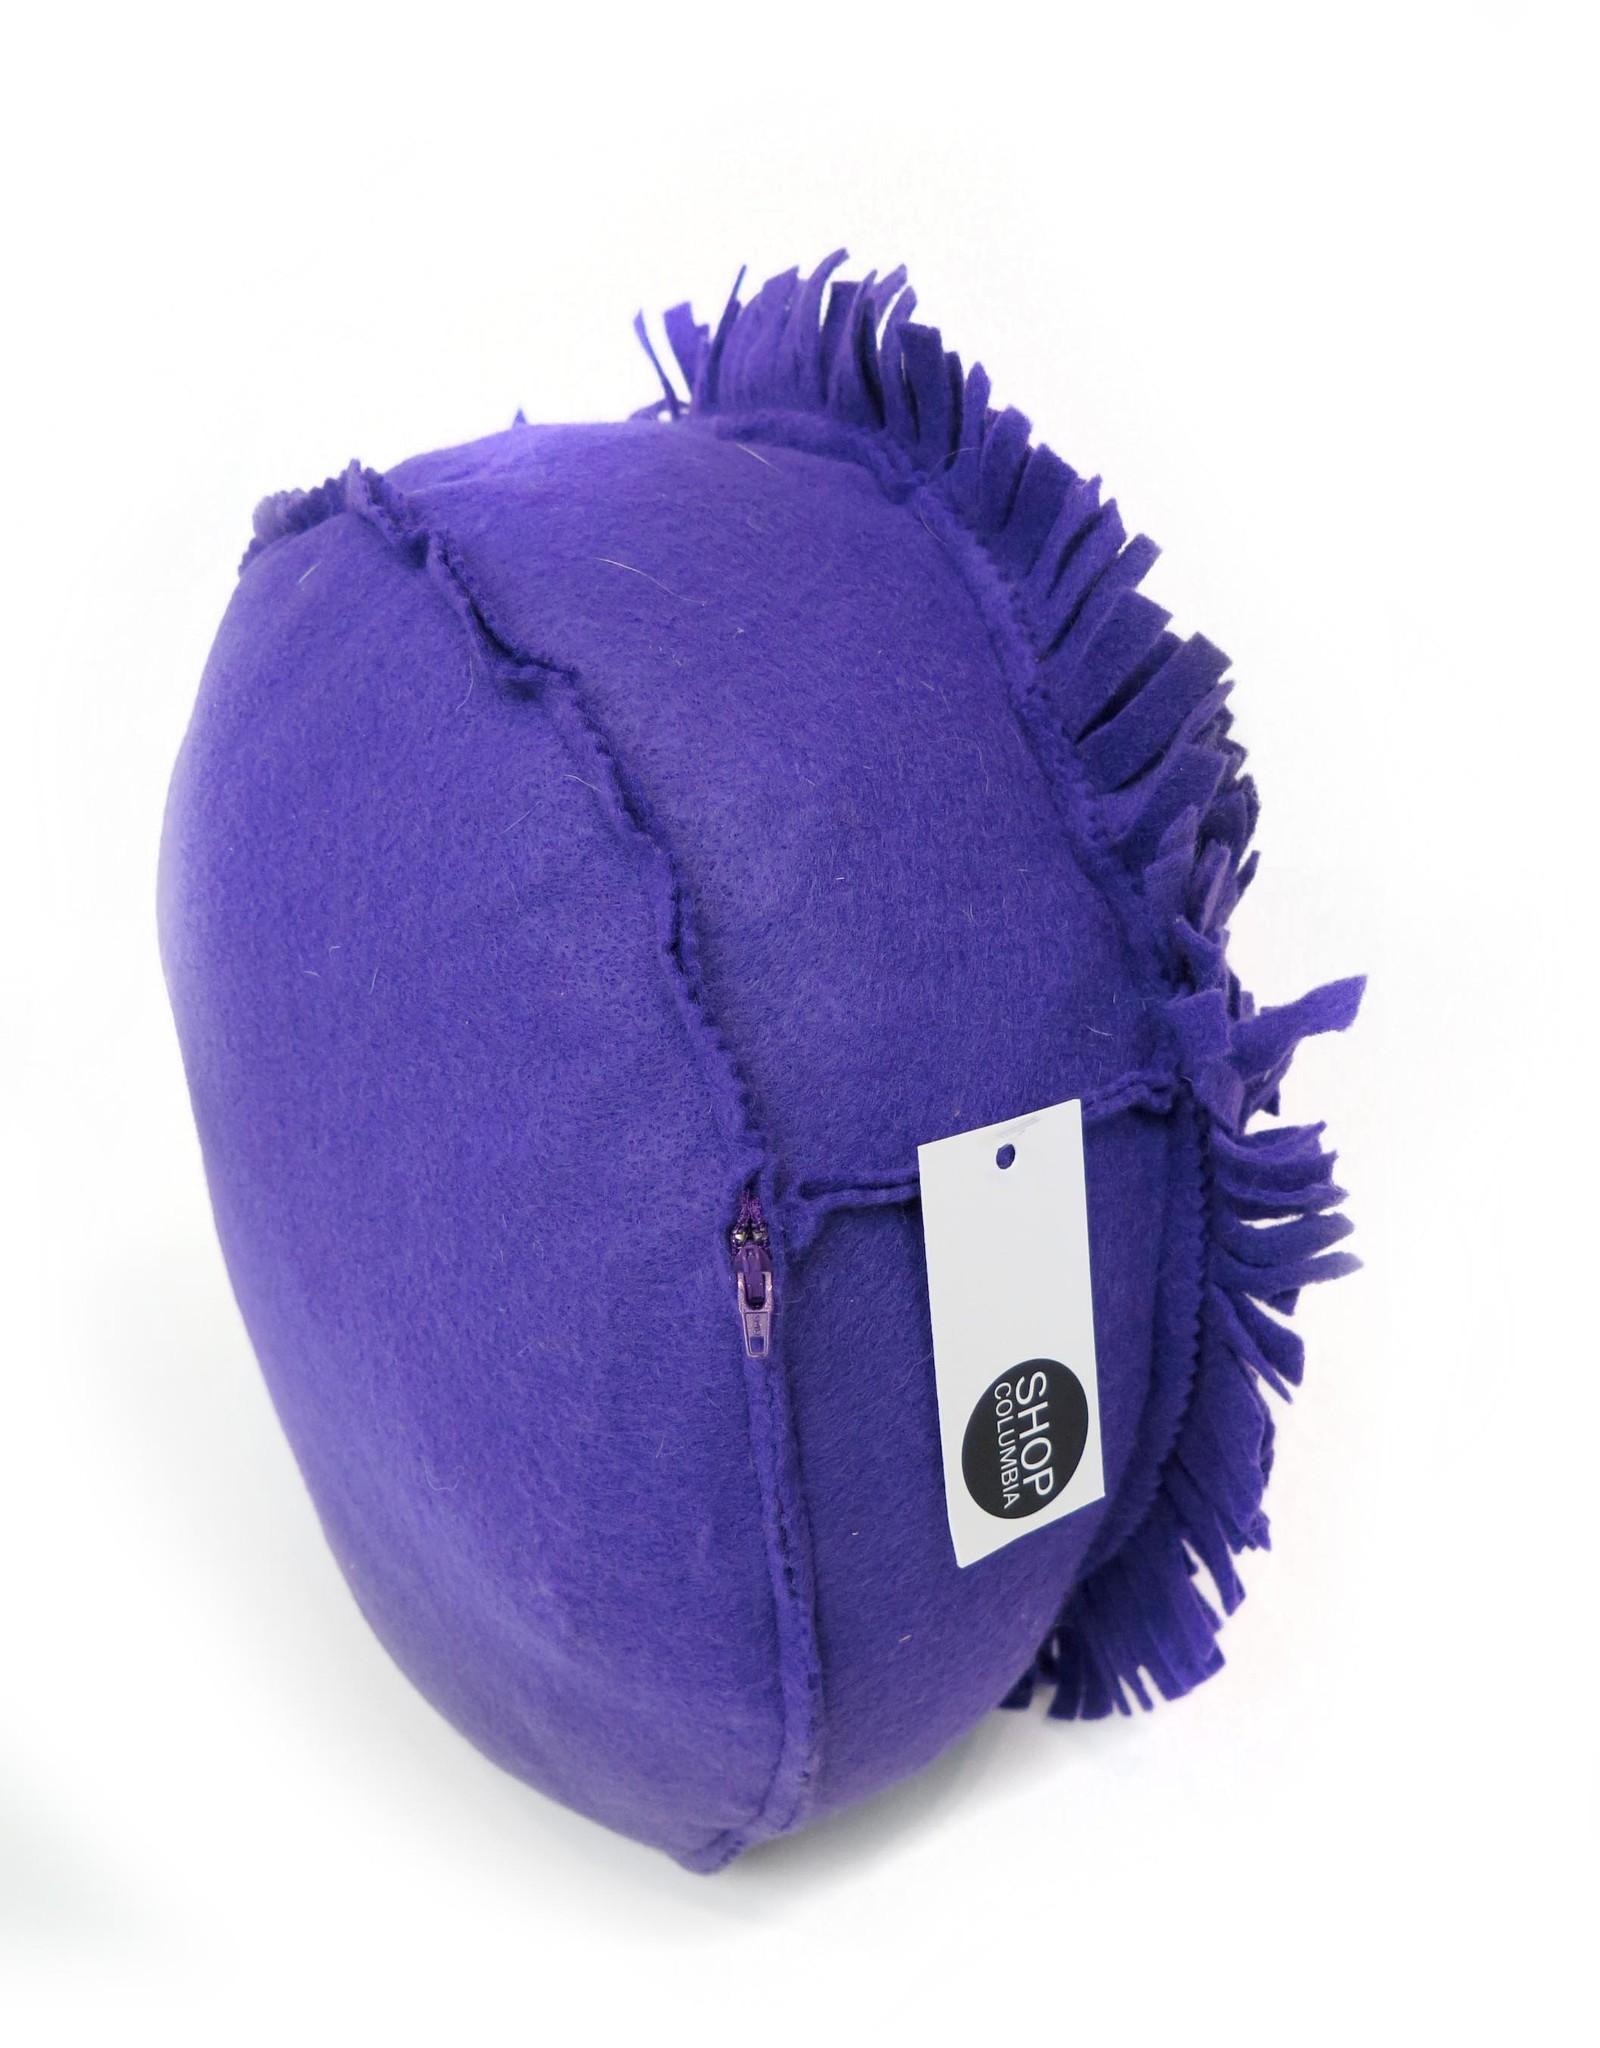 Large Felt Flower Pillow (purple), by Eva Airam Studio